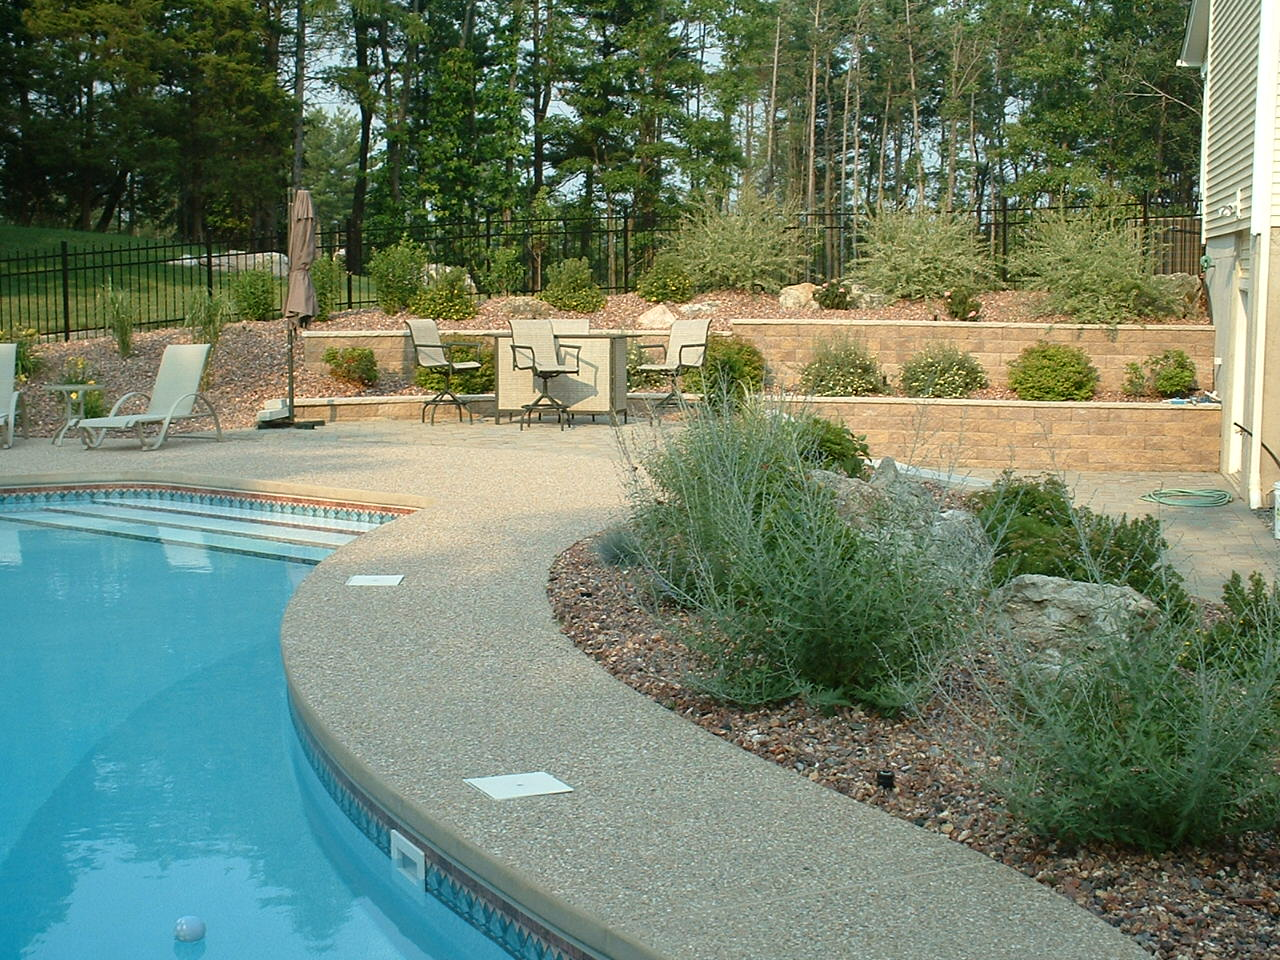 Grahns Pool